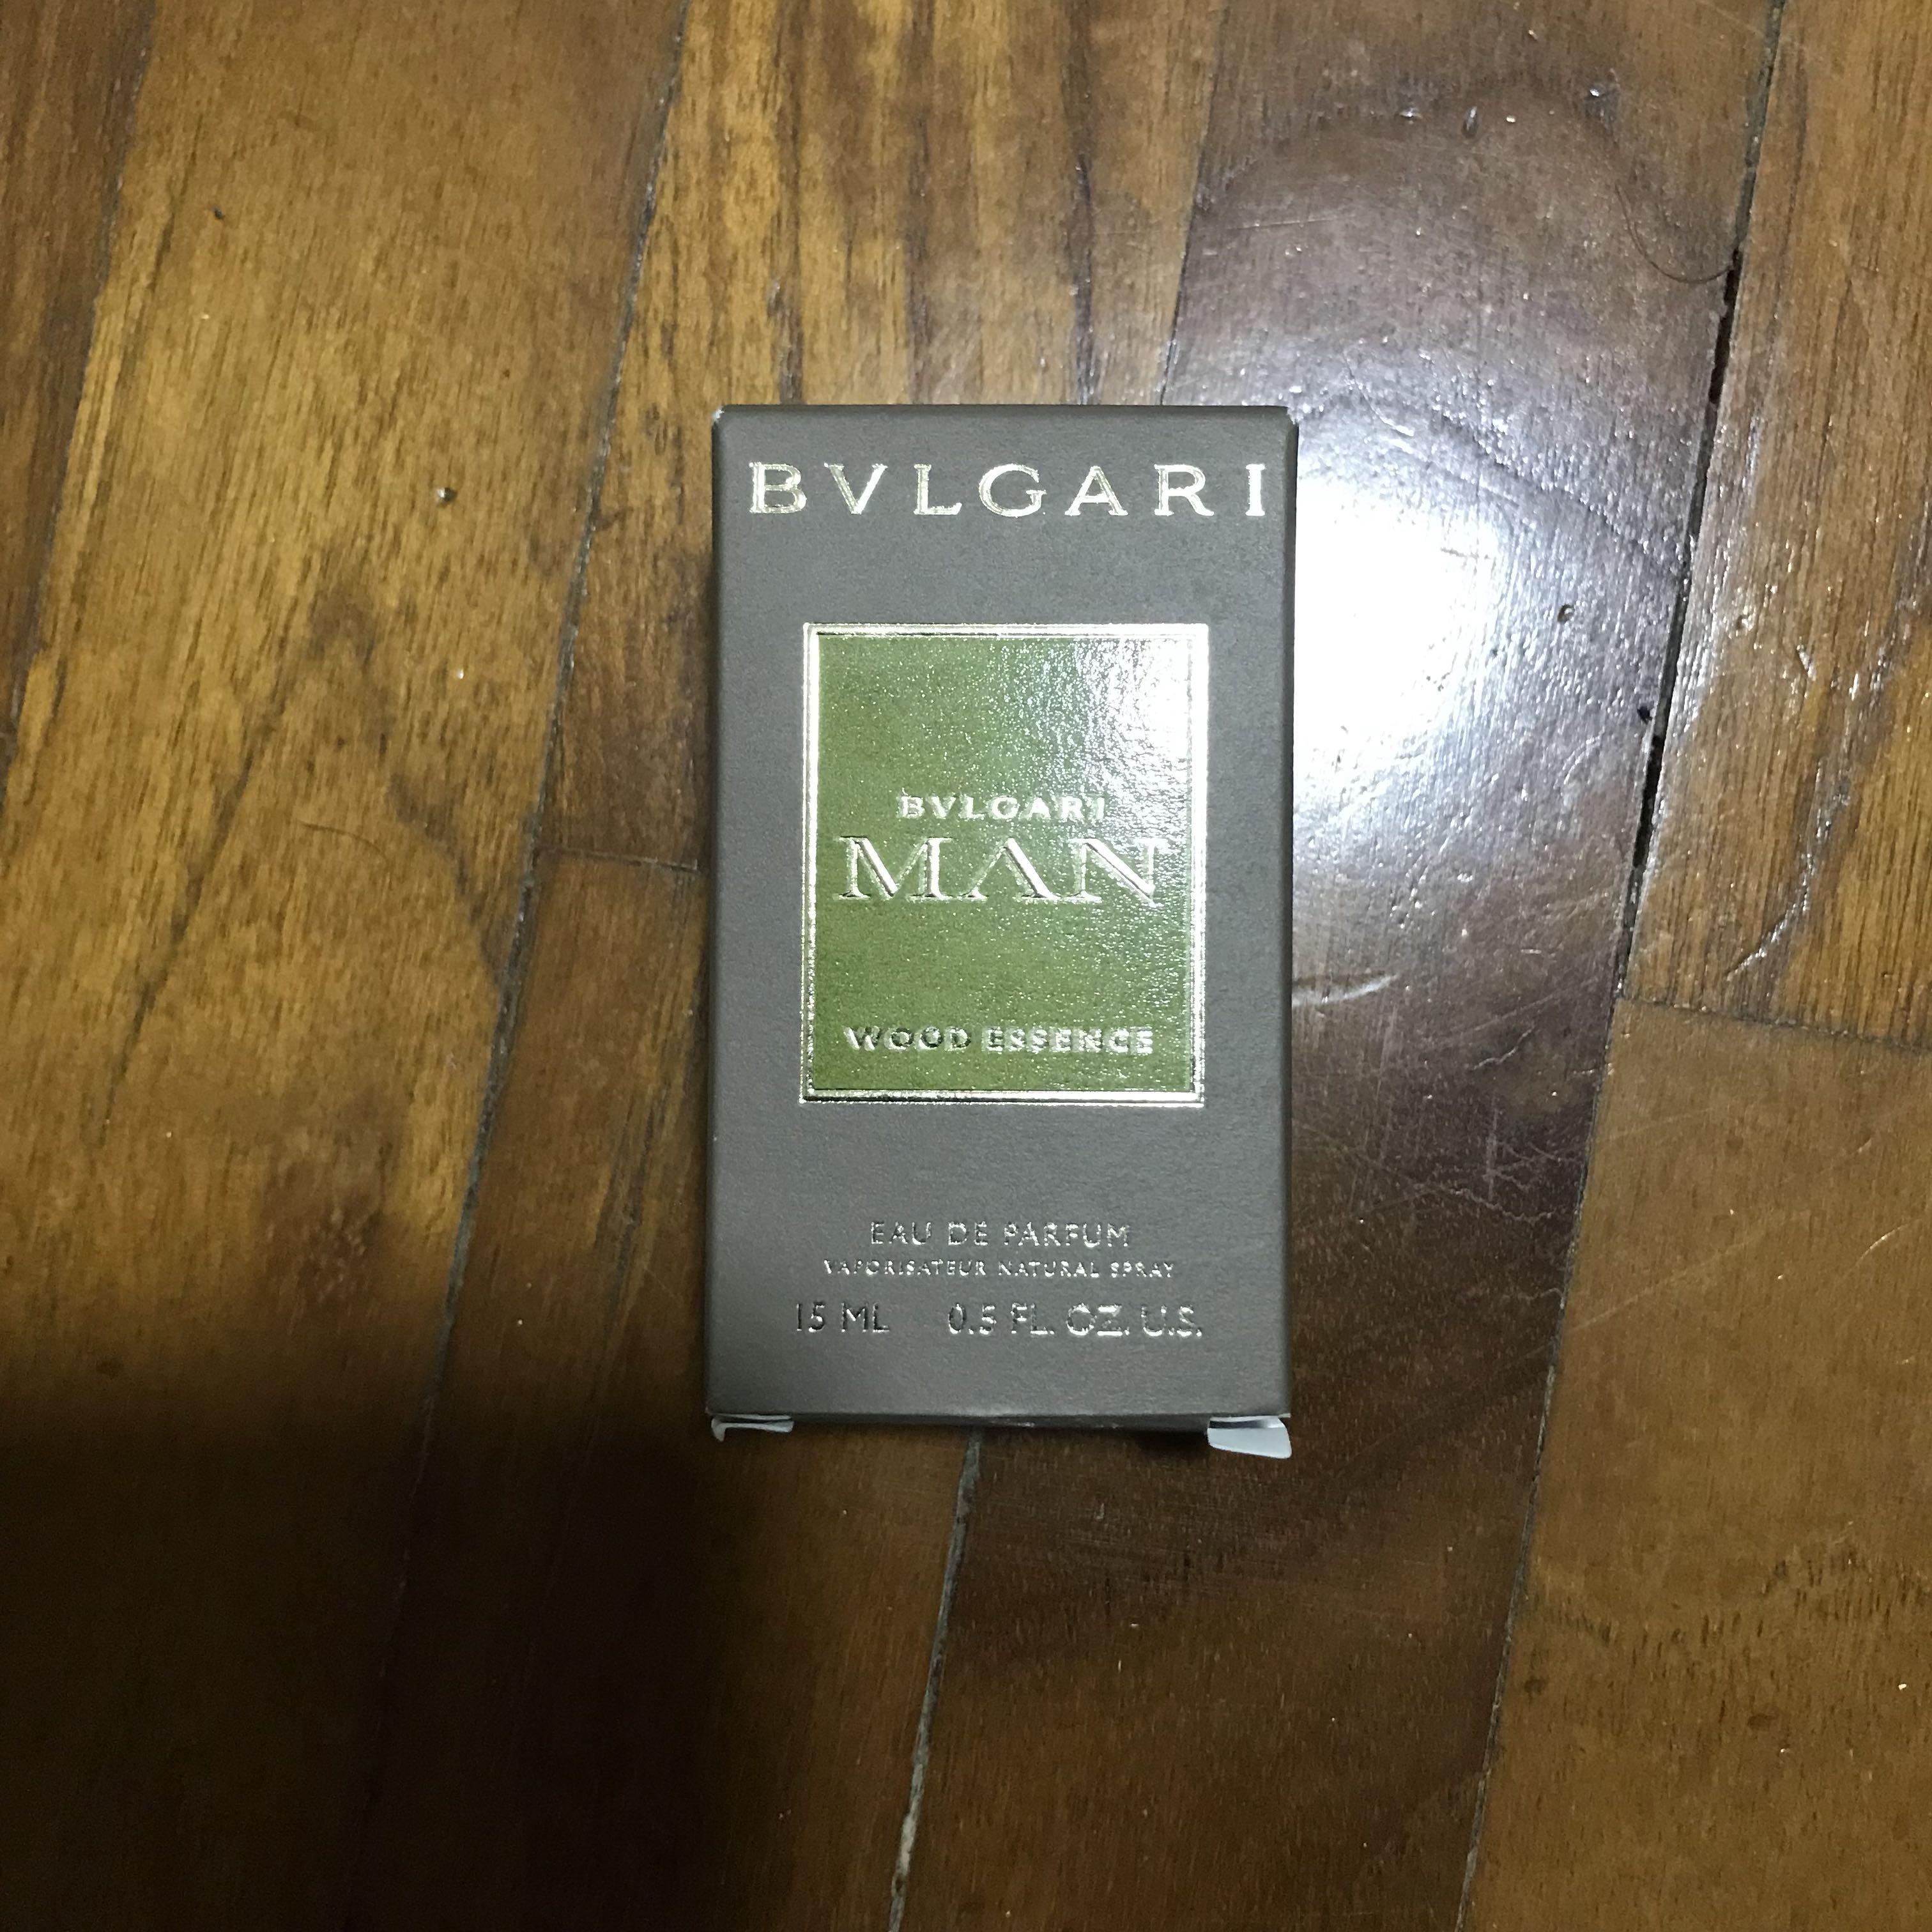 f24c99694af Bvlgari Men Wood Essence 15ml Travel Spray (Just Released!)